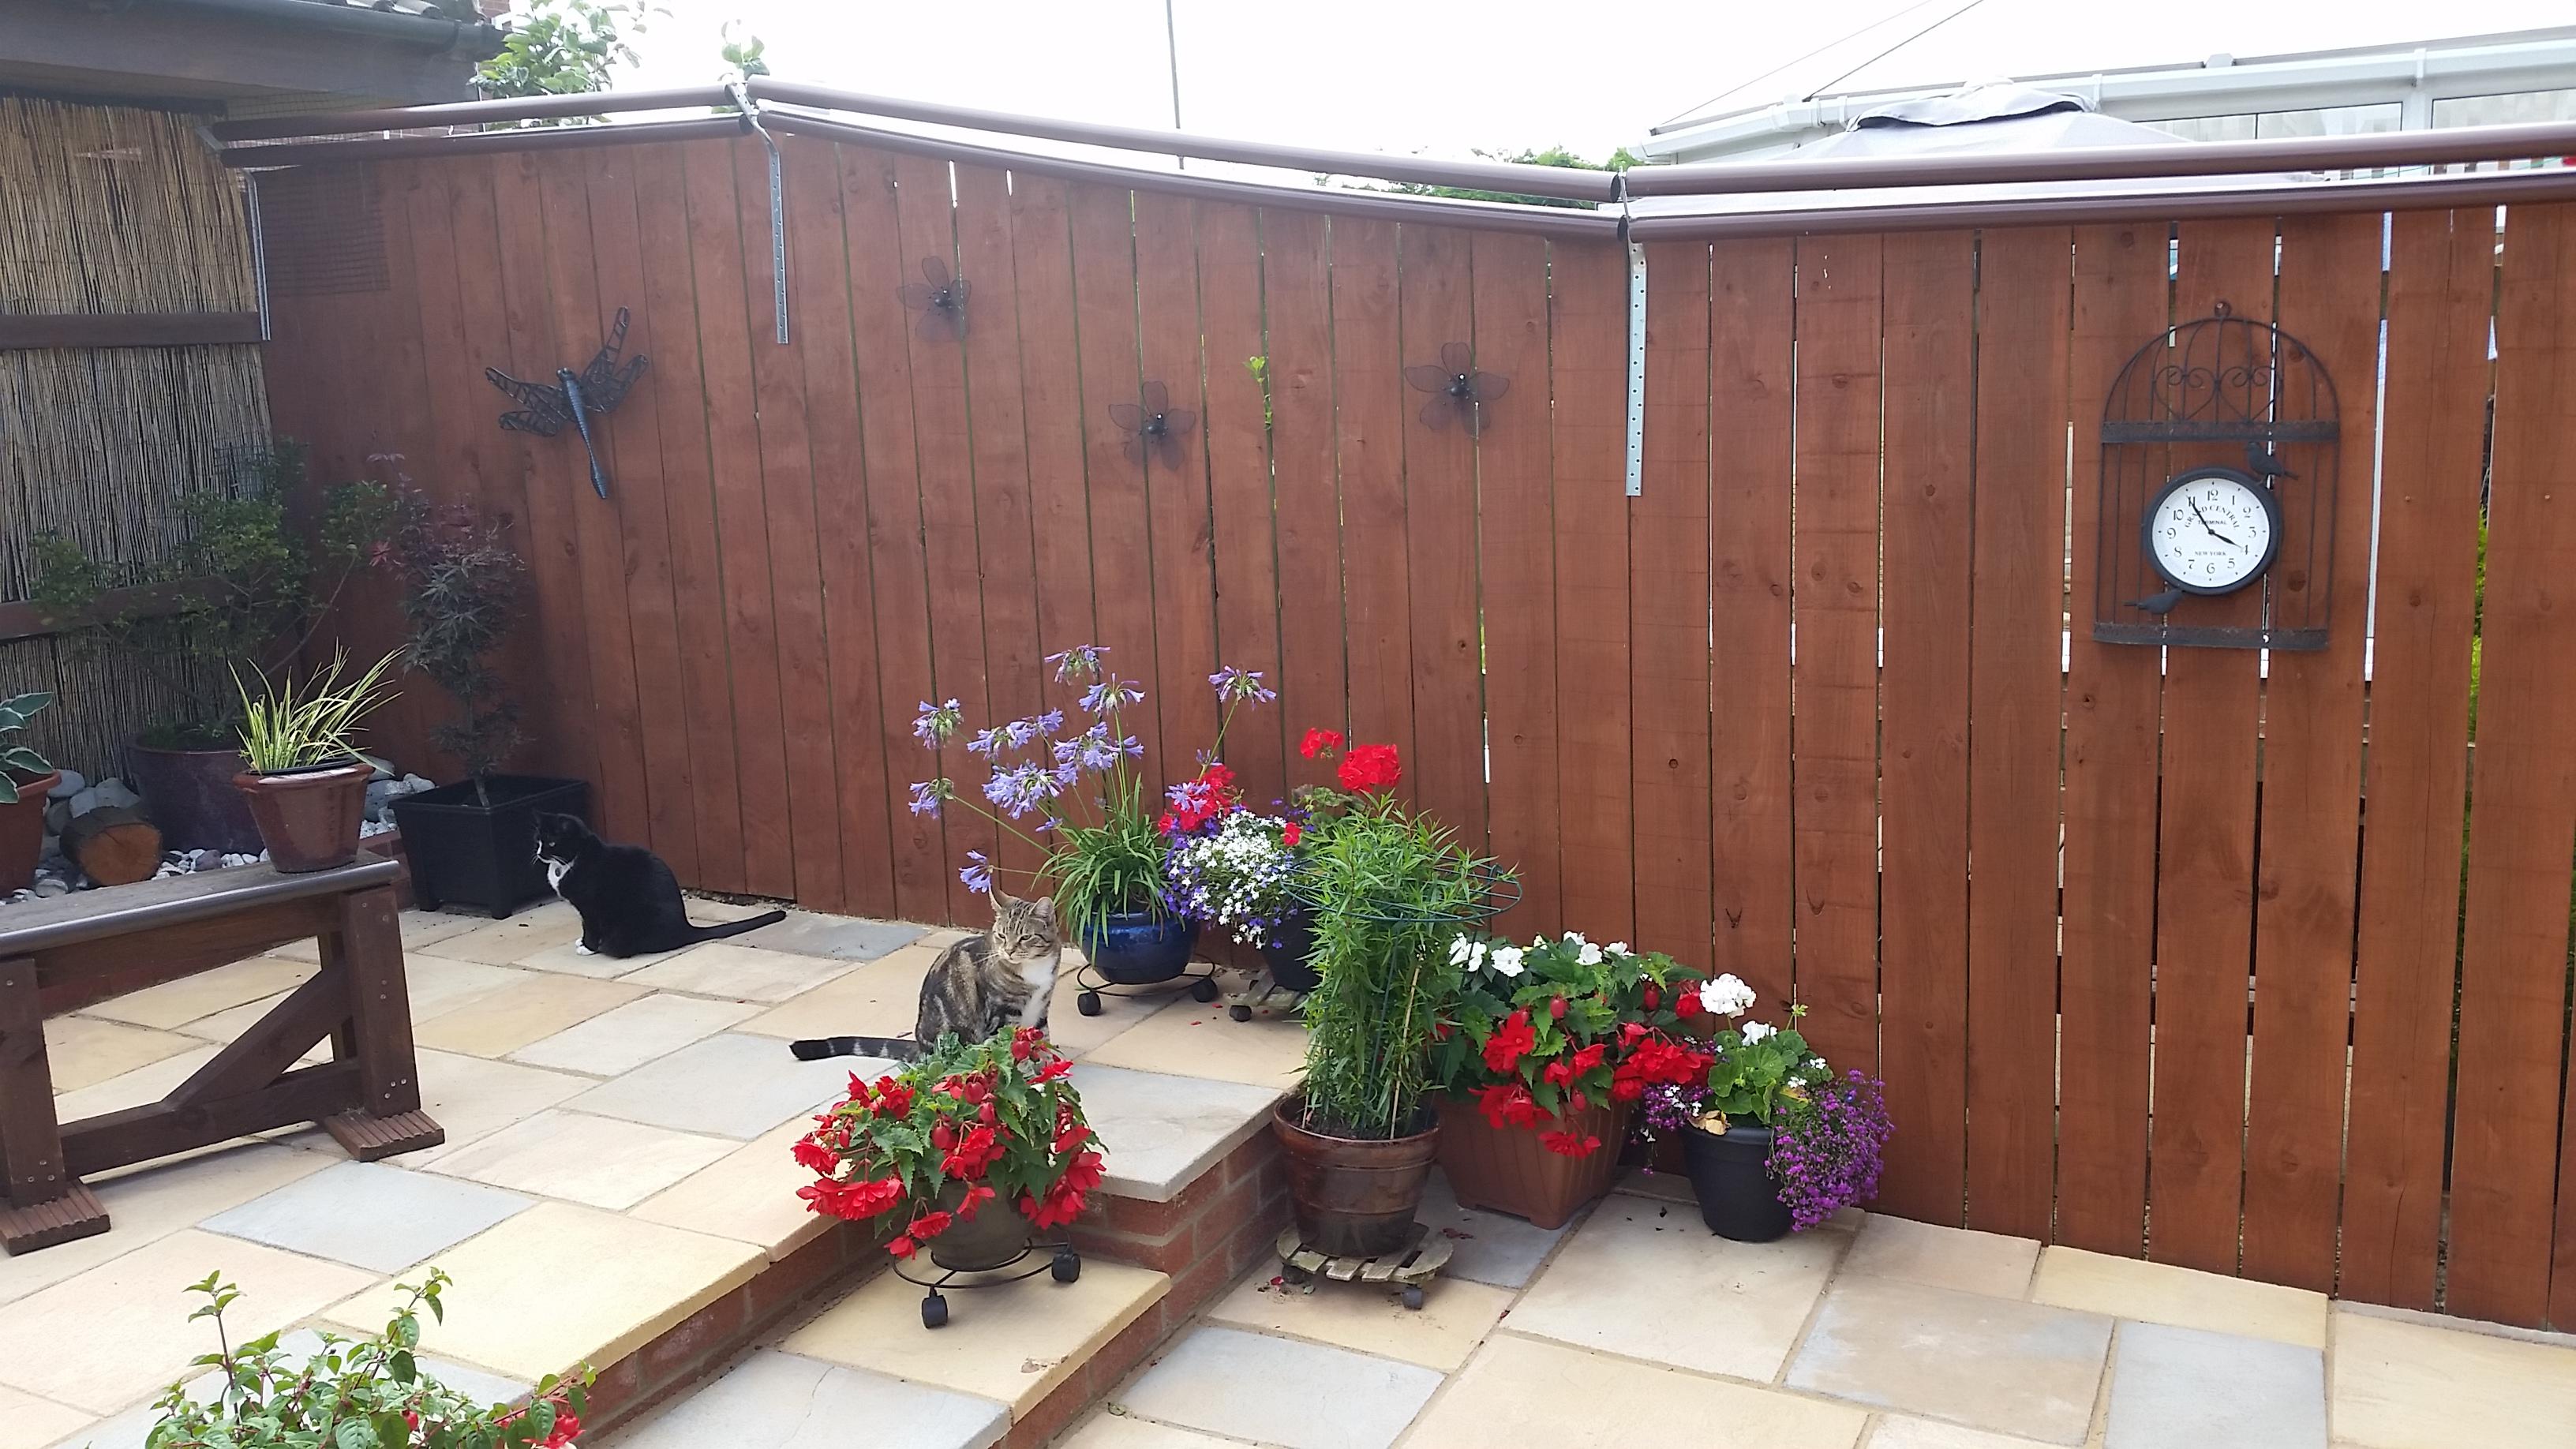 Outdoor Cat Enclosure How To Build